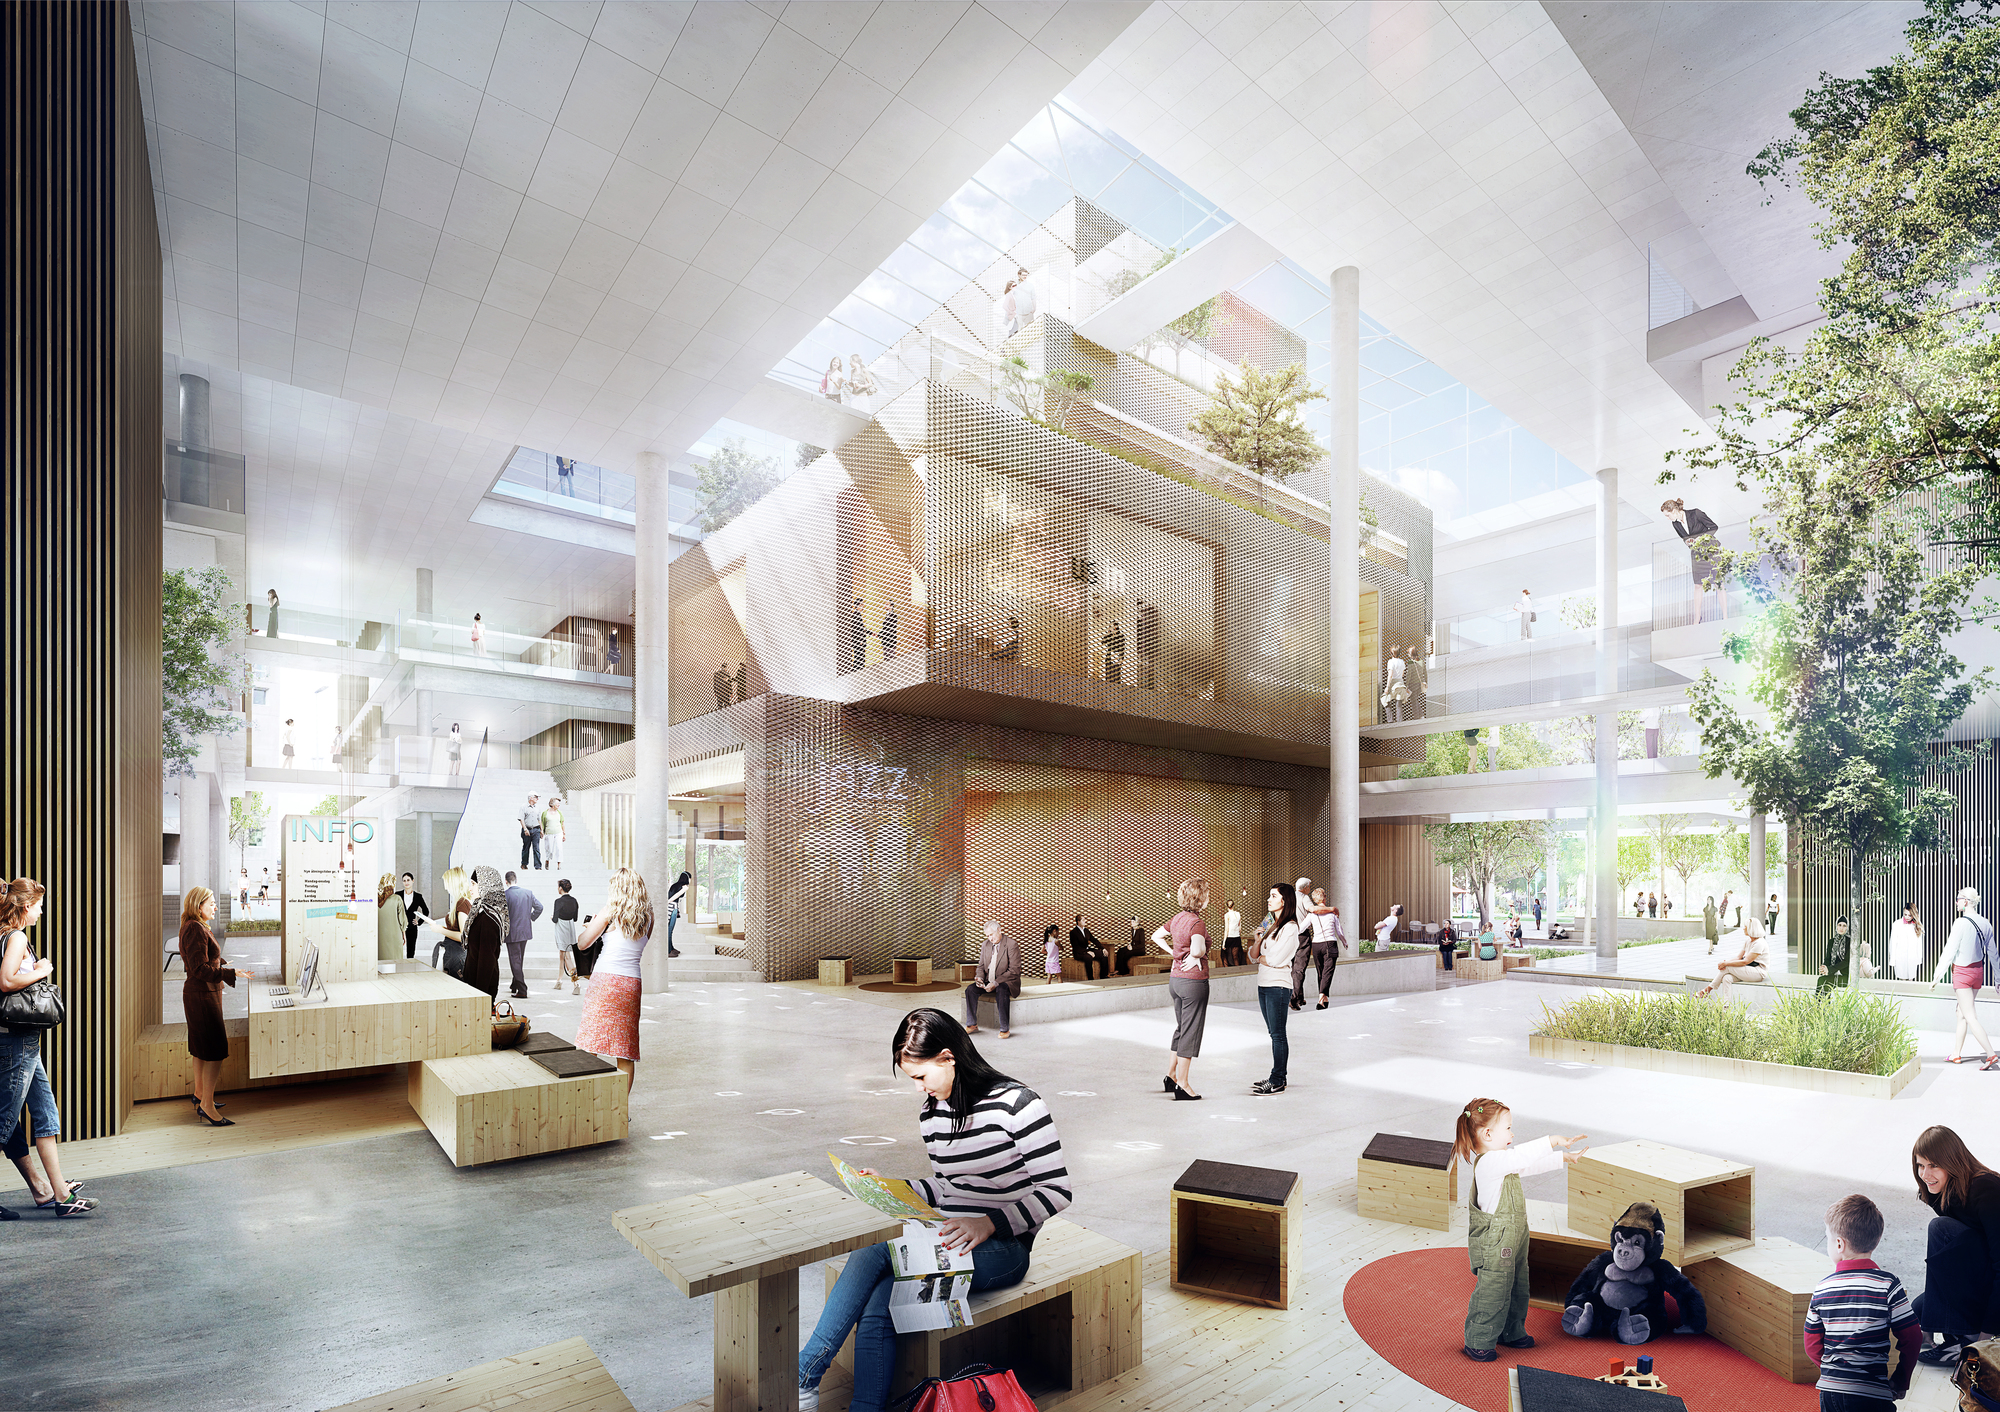 Arkitema designs municipal office building for aarhus - Office building interior design ideas ...